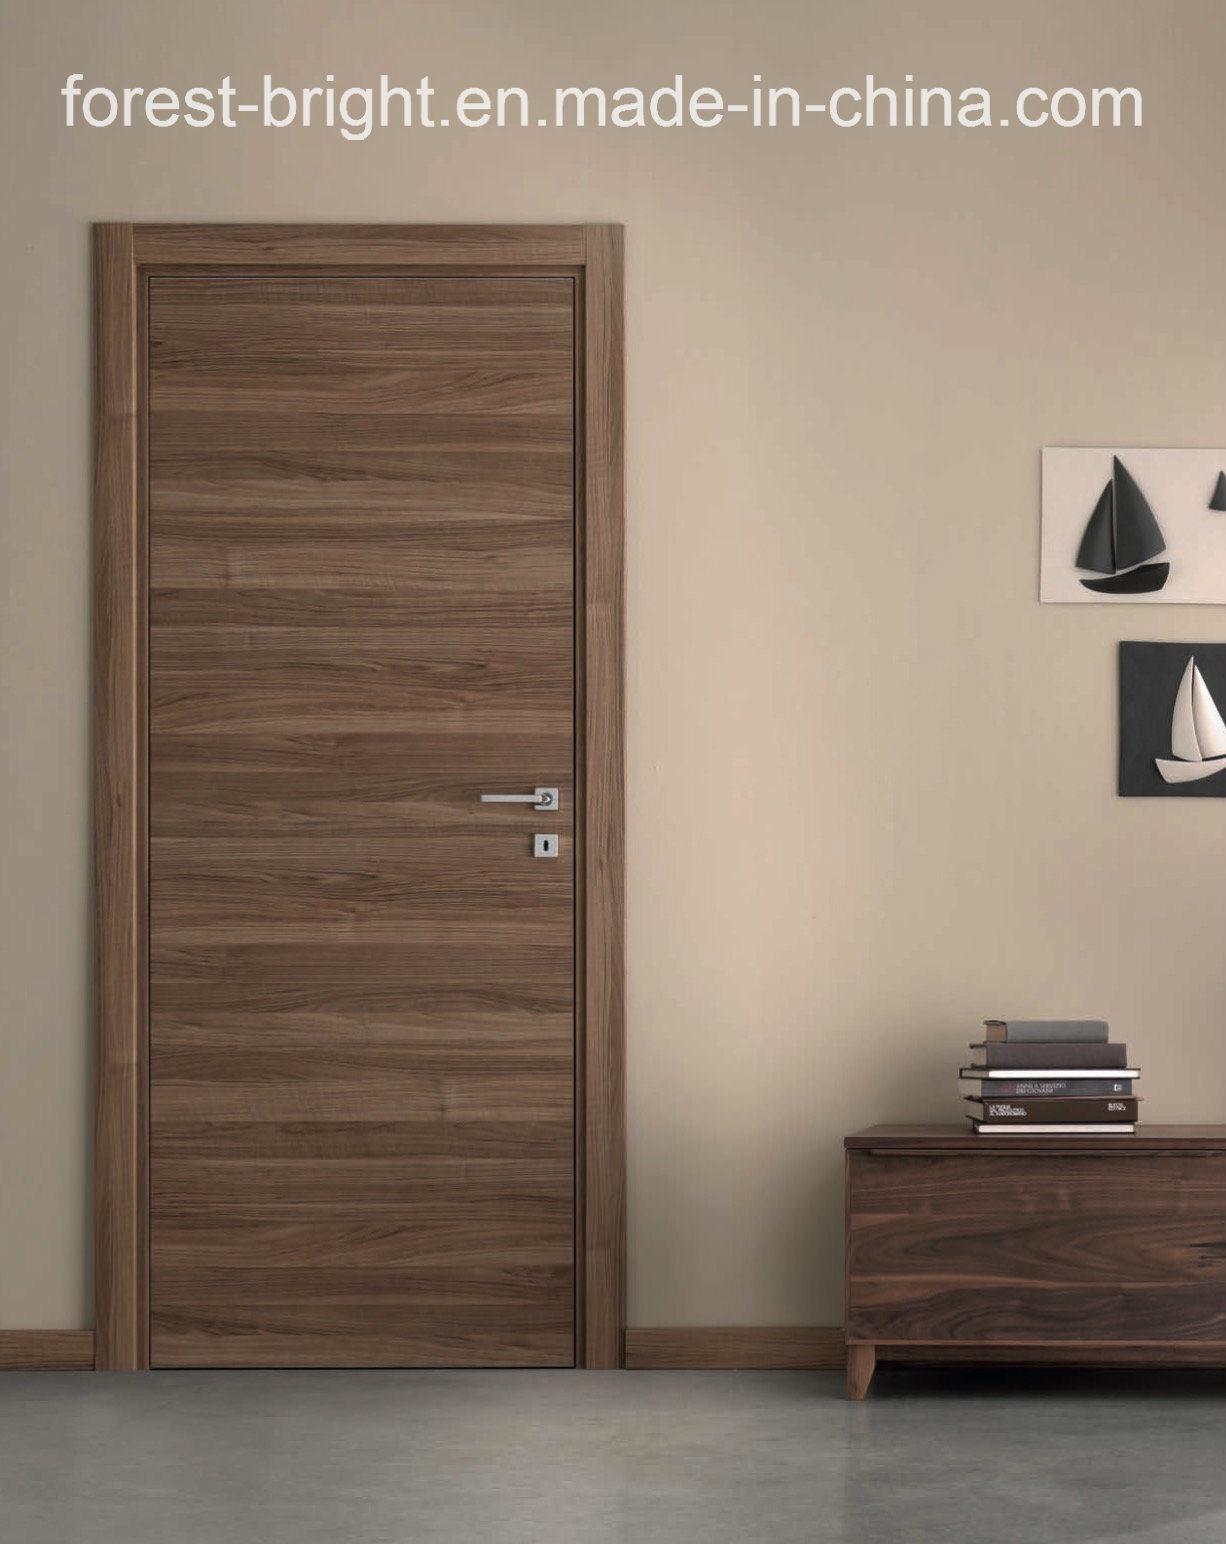 Room Showcase Designs Recommended Mdf Living: China Natural Veneered Wooden Flush Door Design MDF Living